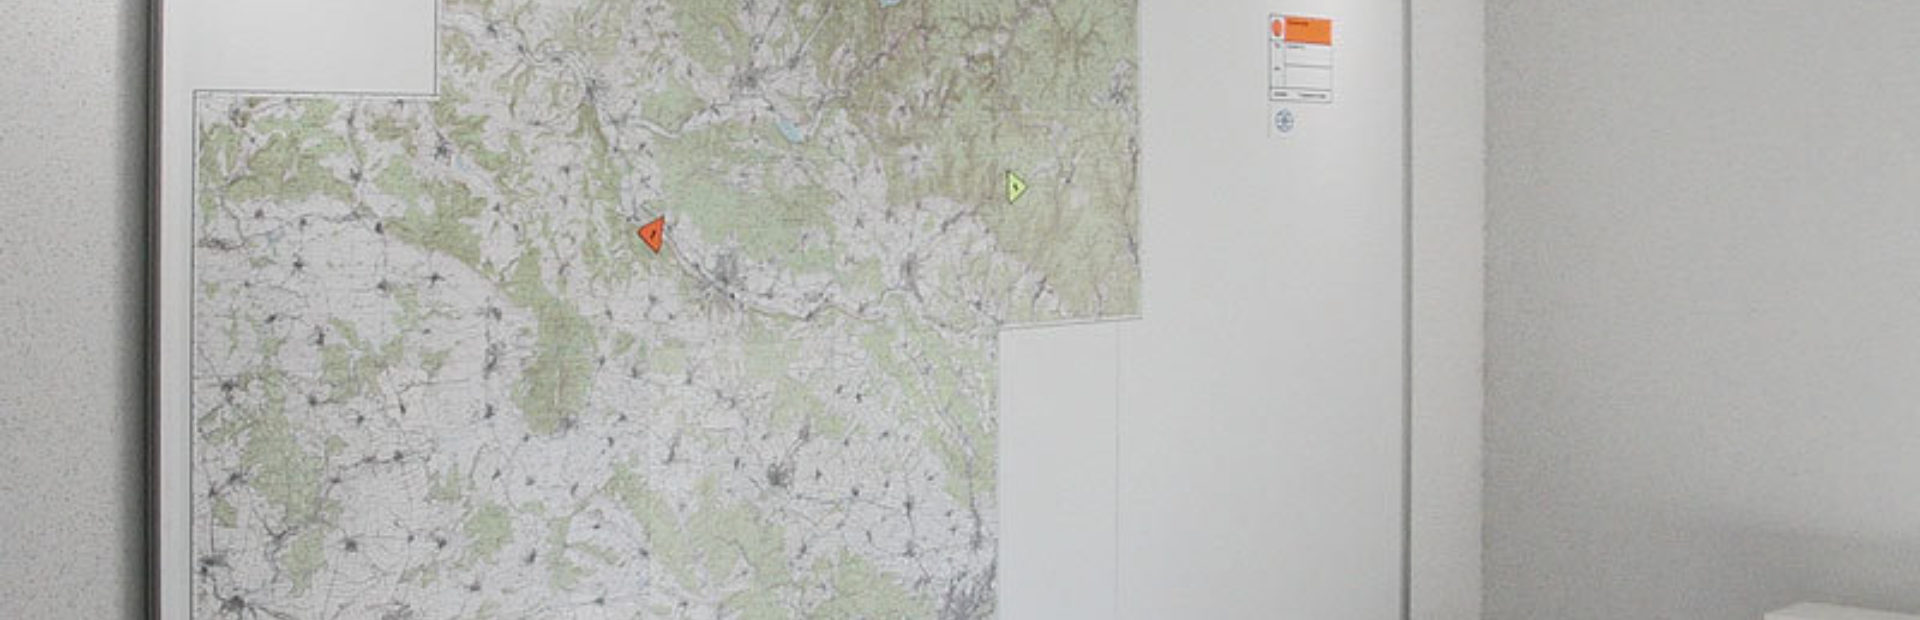 Wandtafel mit Magnetkarte